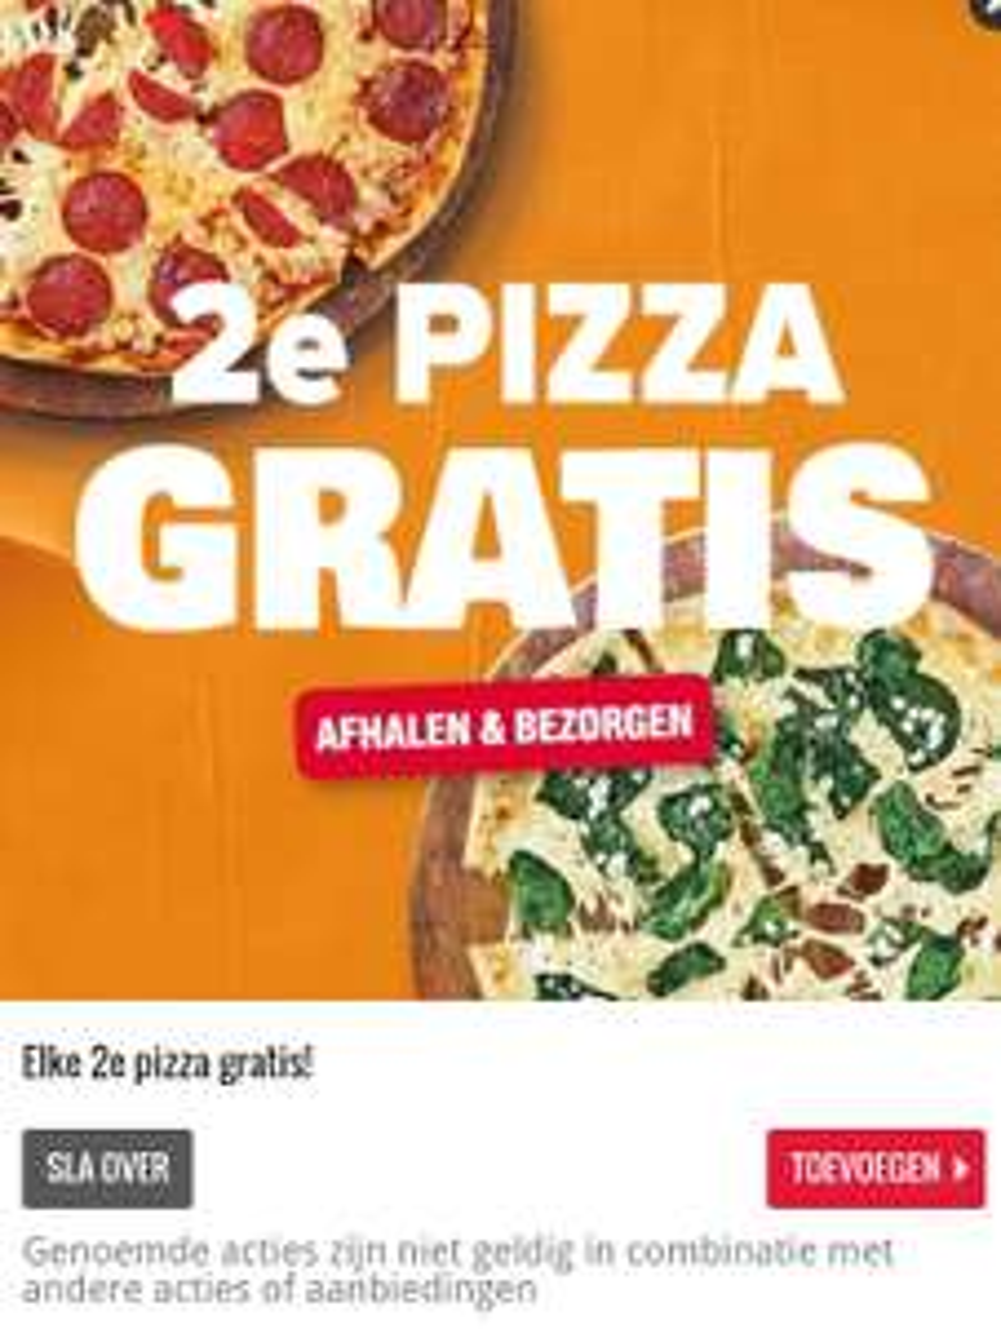 2de pizza gratis bezorgen en afhalen (locale aanbieding?)